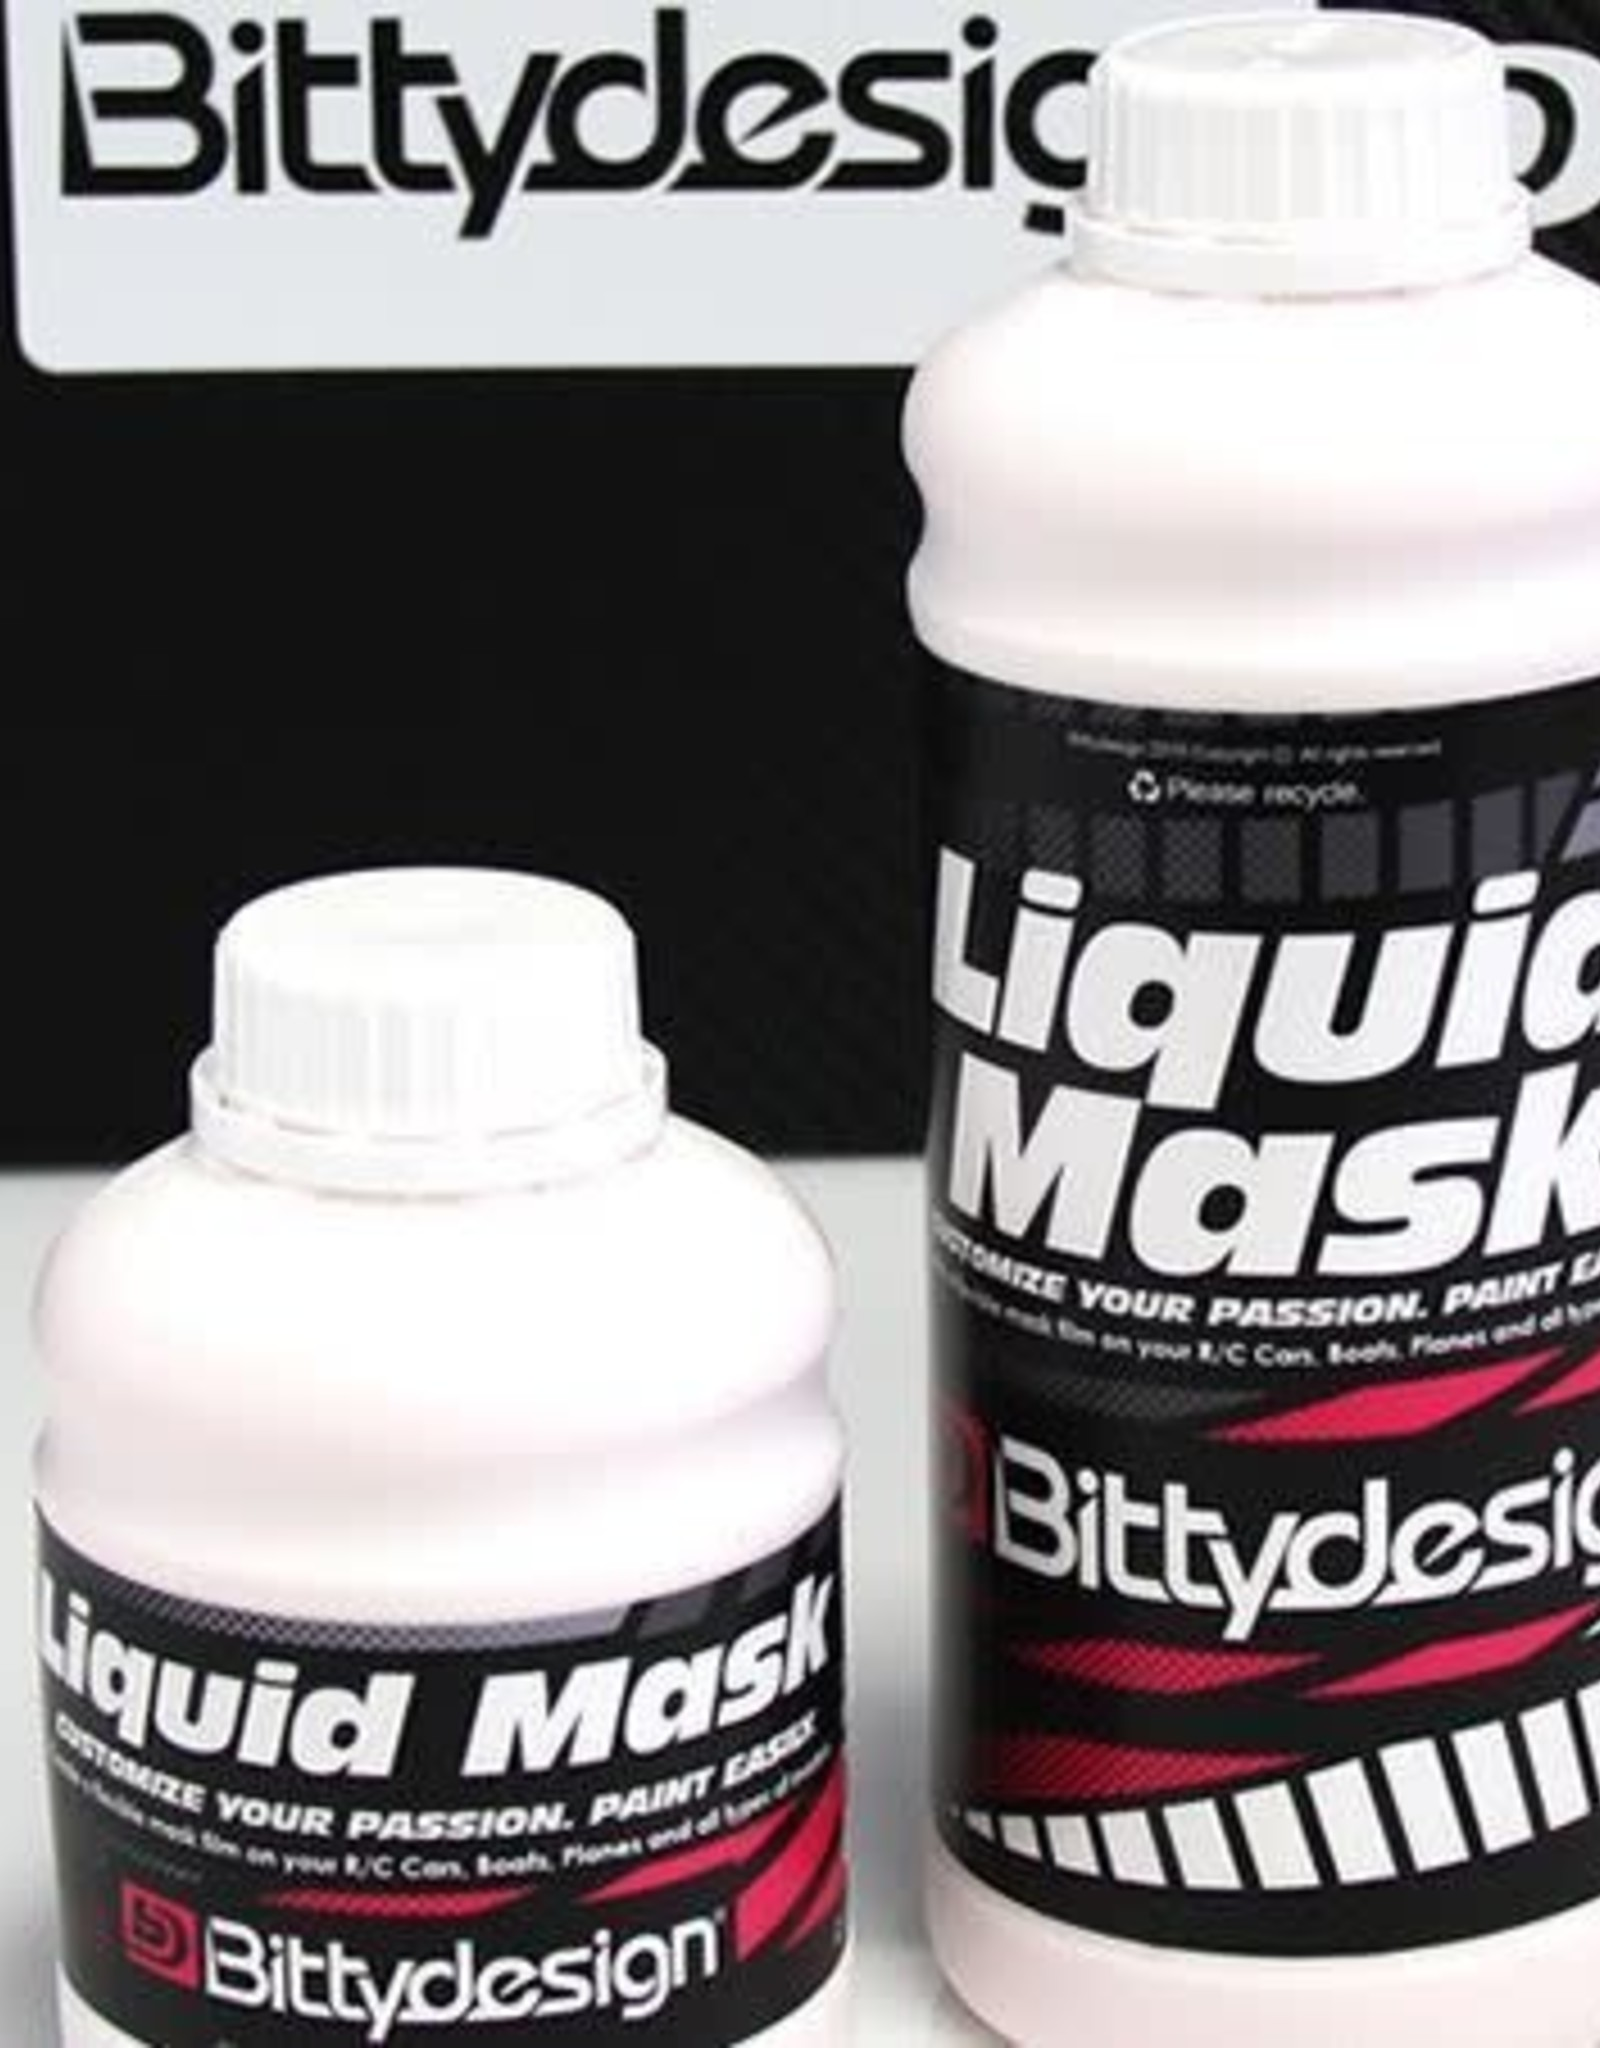 Bittydesign Bittydesign liquid mask 16oz